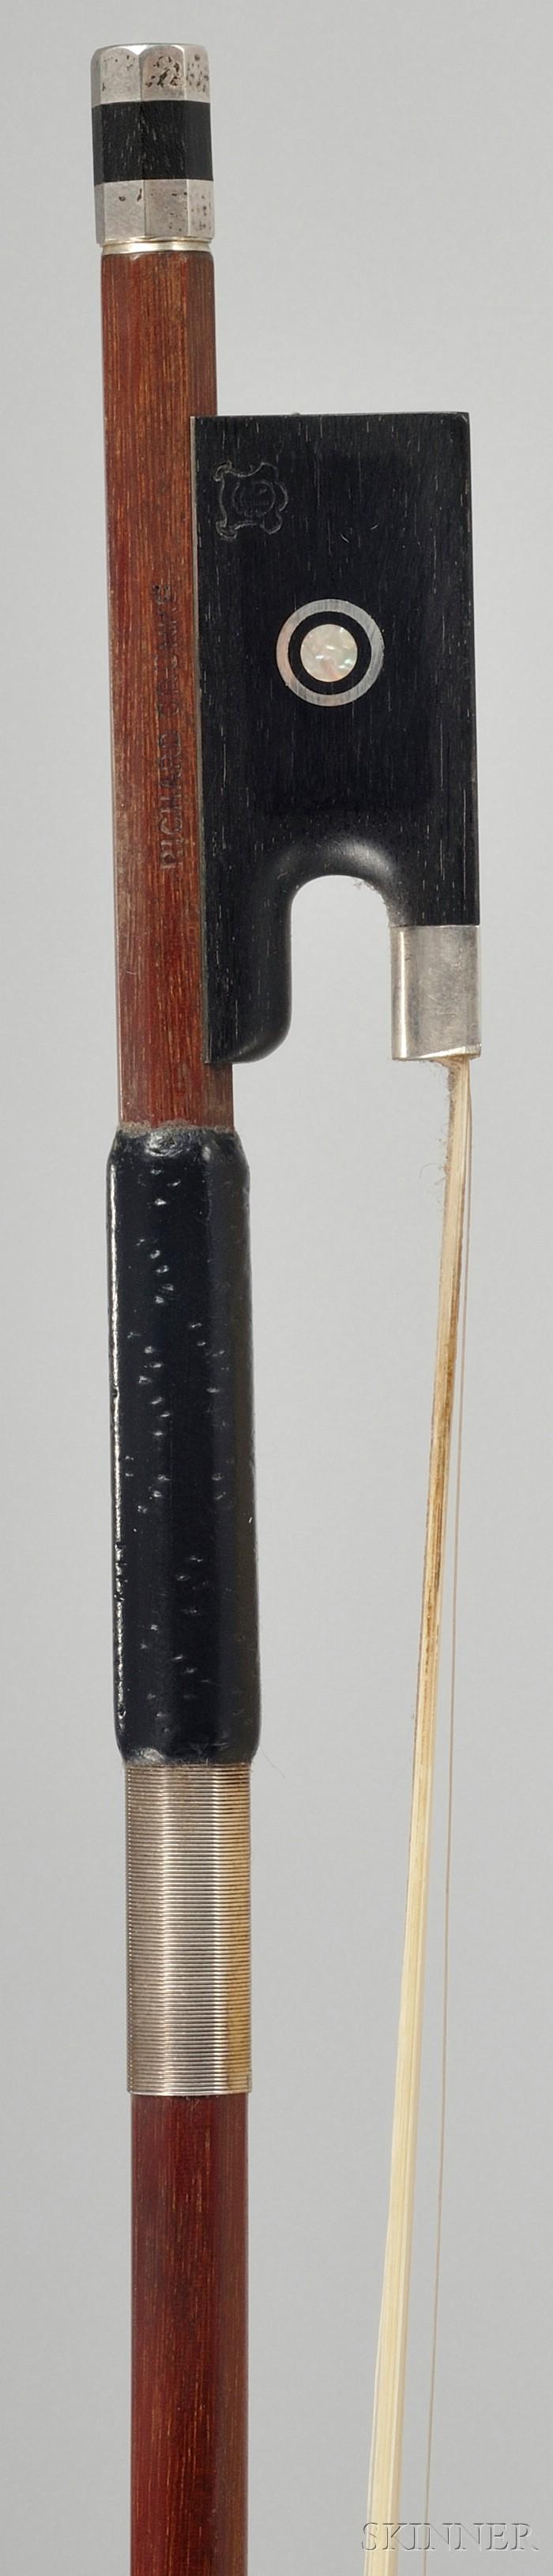 Silver Mounted Violin Bow, Richard Grunke